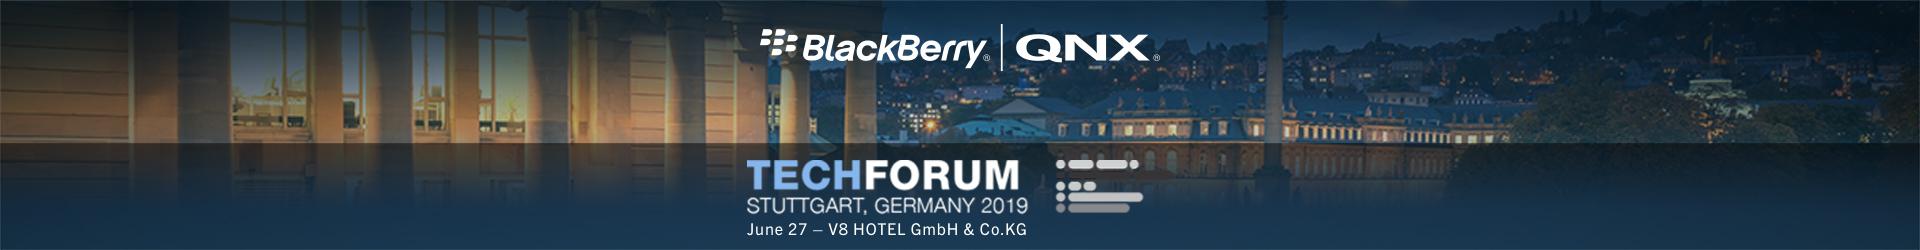 Germany TECHForum 2019